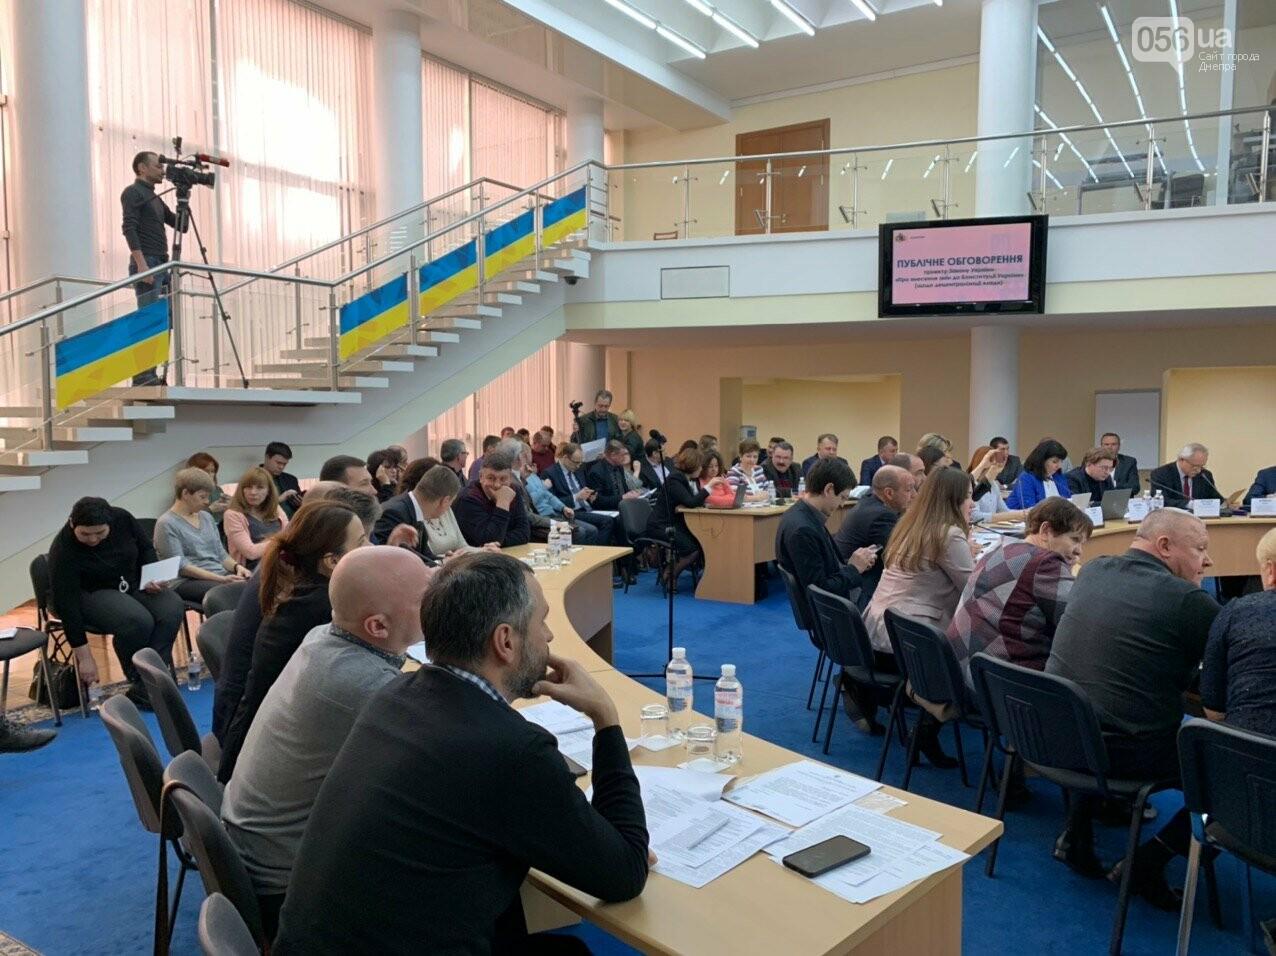 В Днепре представители трех областей обсуждают реформу децентрализации, - ФОТО, ВИДЕО, фото-2